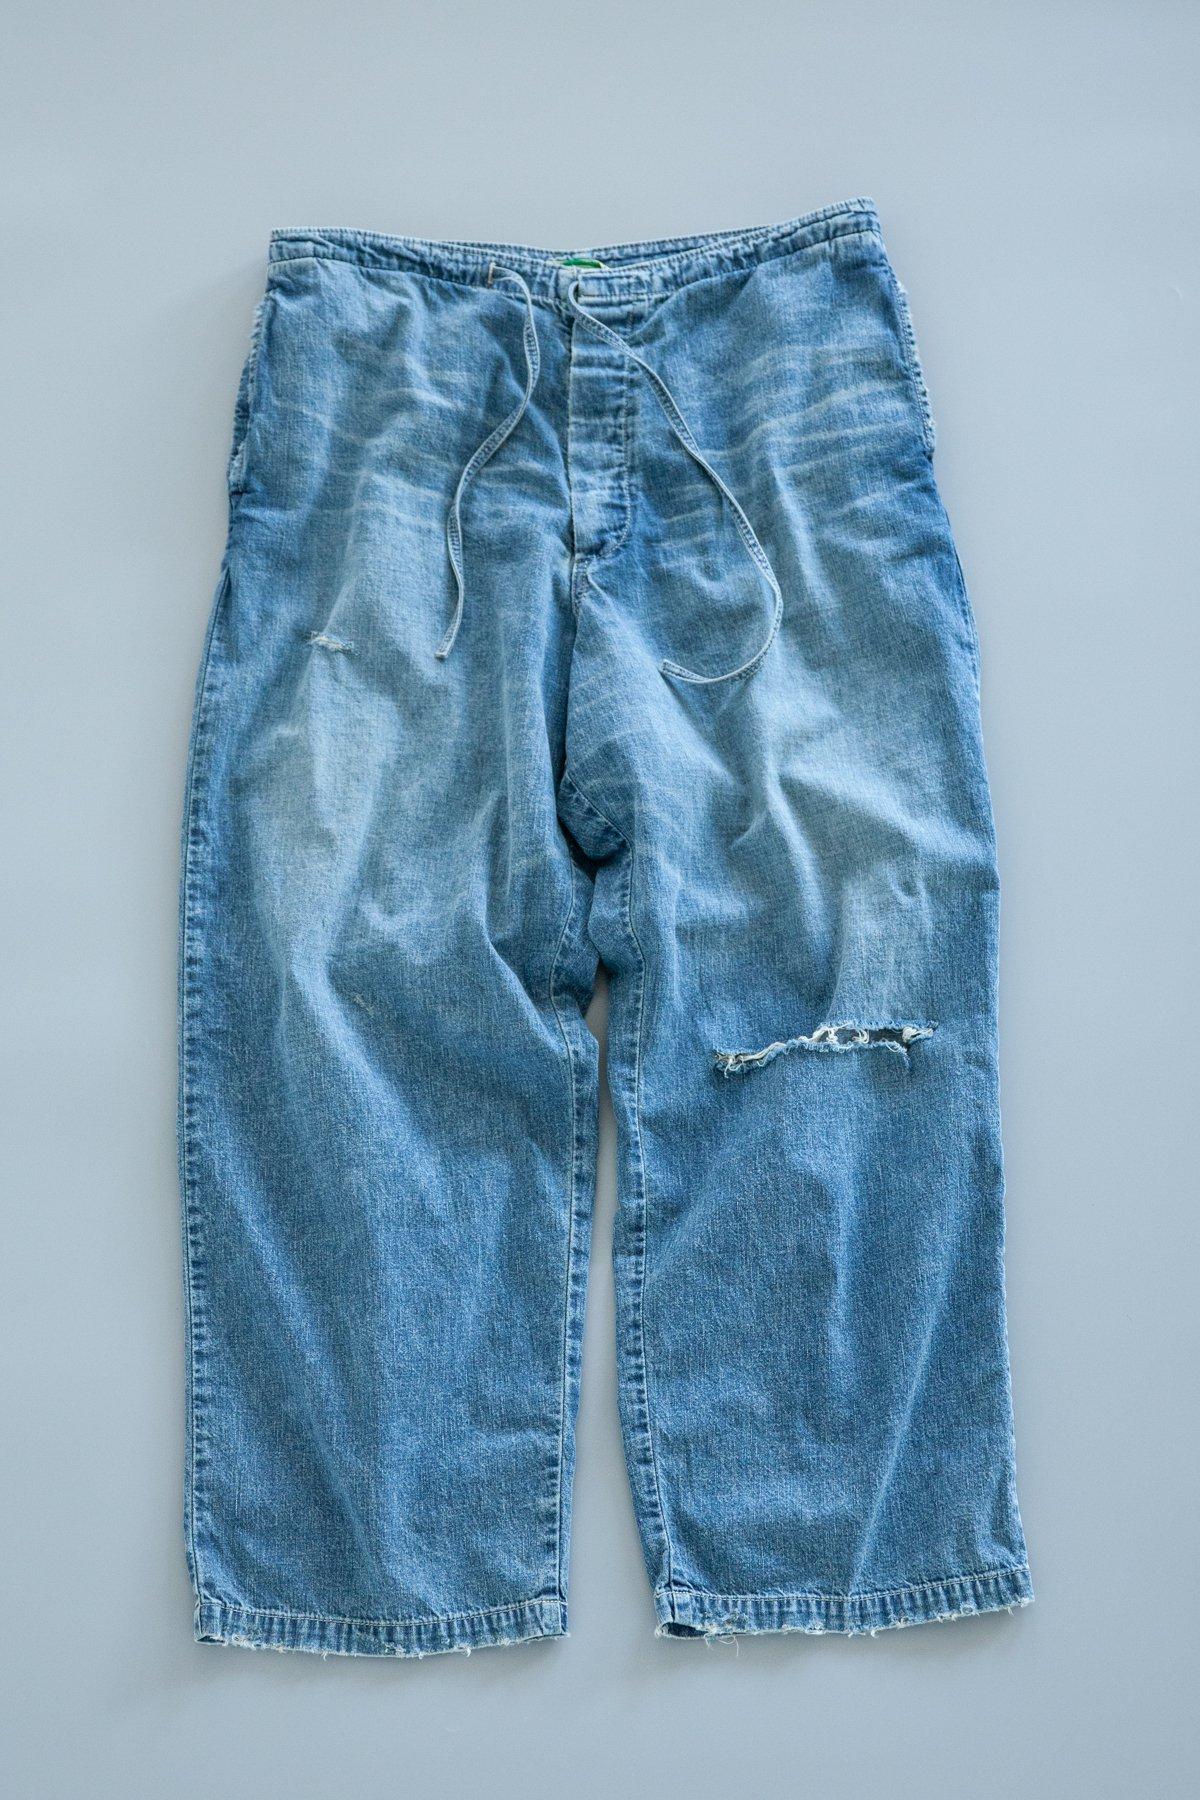 Zepanese Club × MexiPa / Denim Mexican Pants